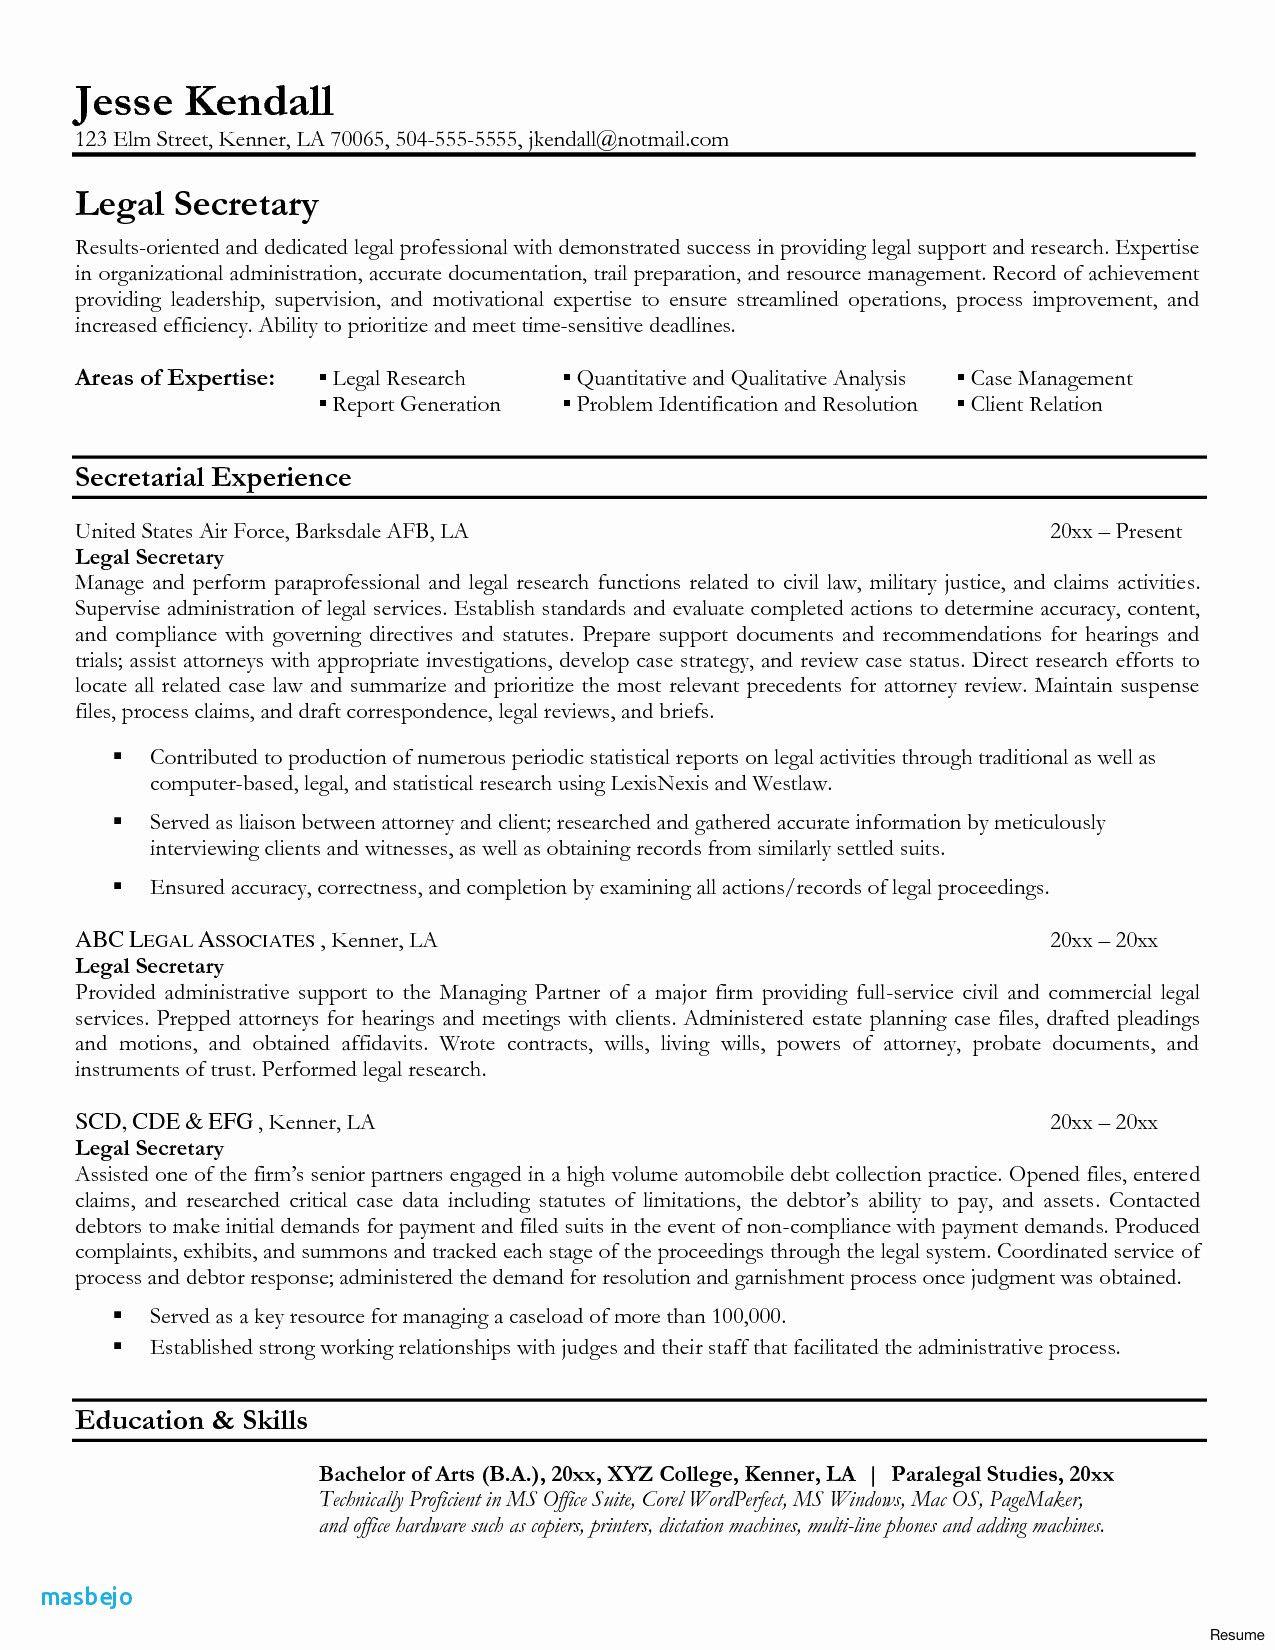 Modern resume template ms word. Perfect resume | modern resume.